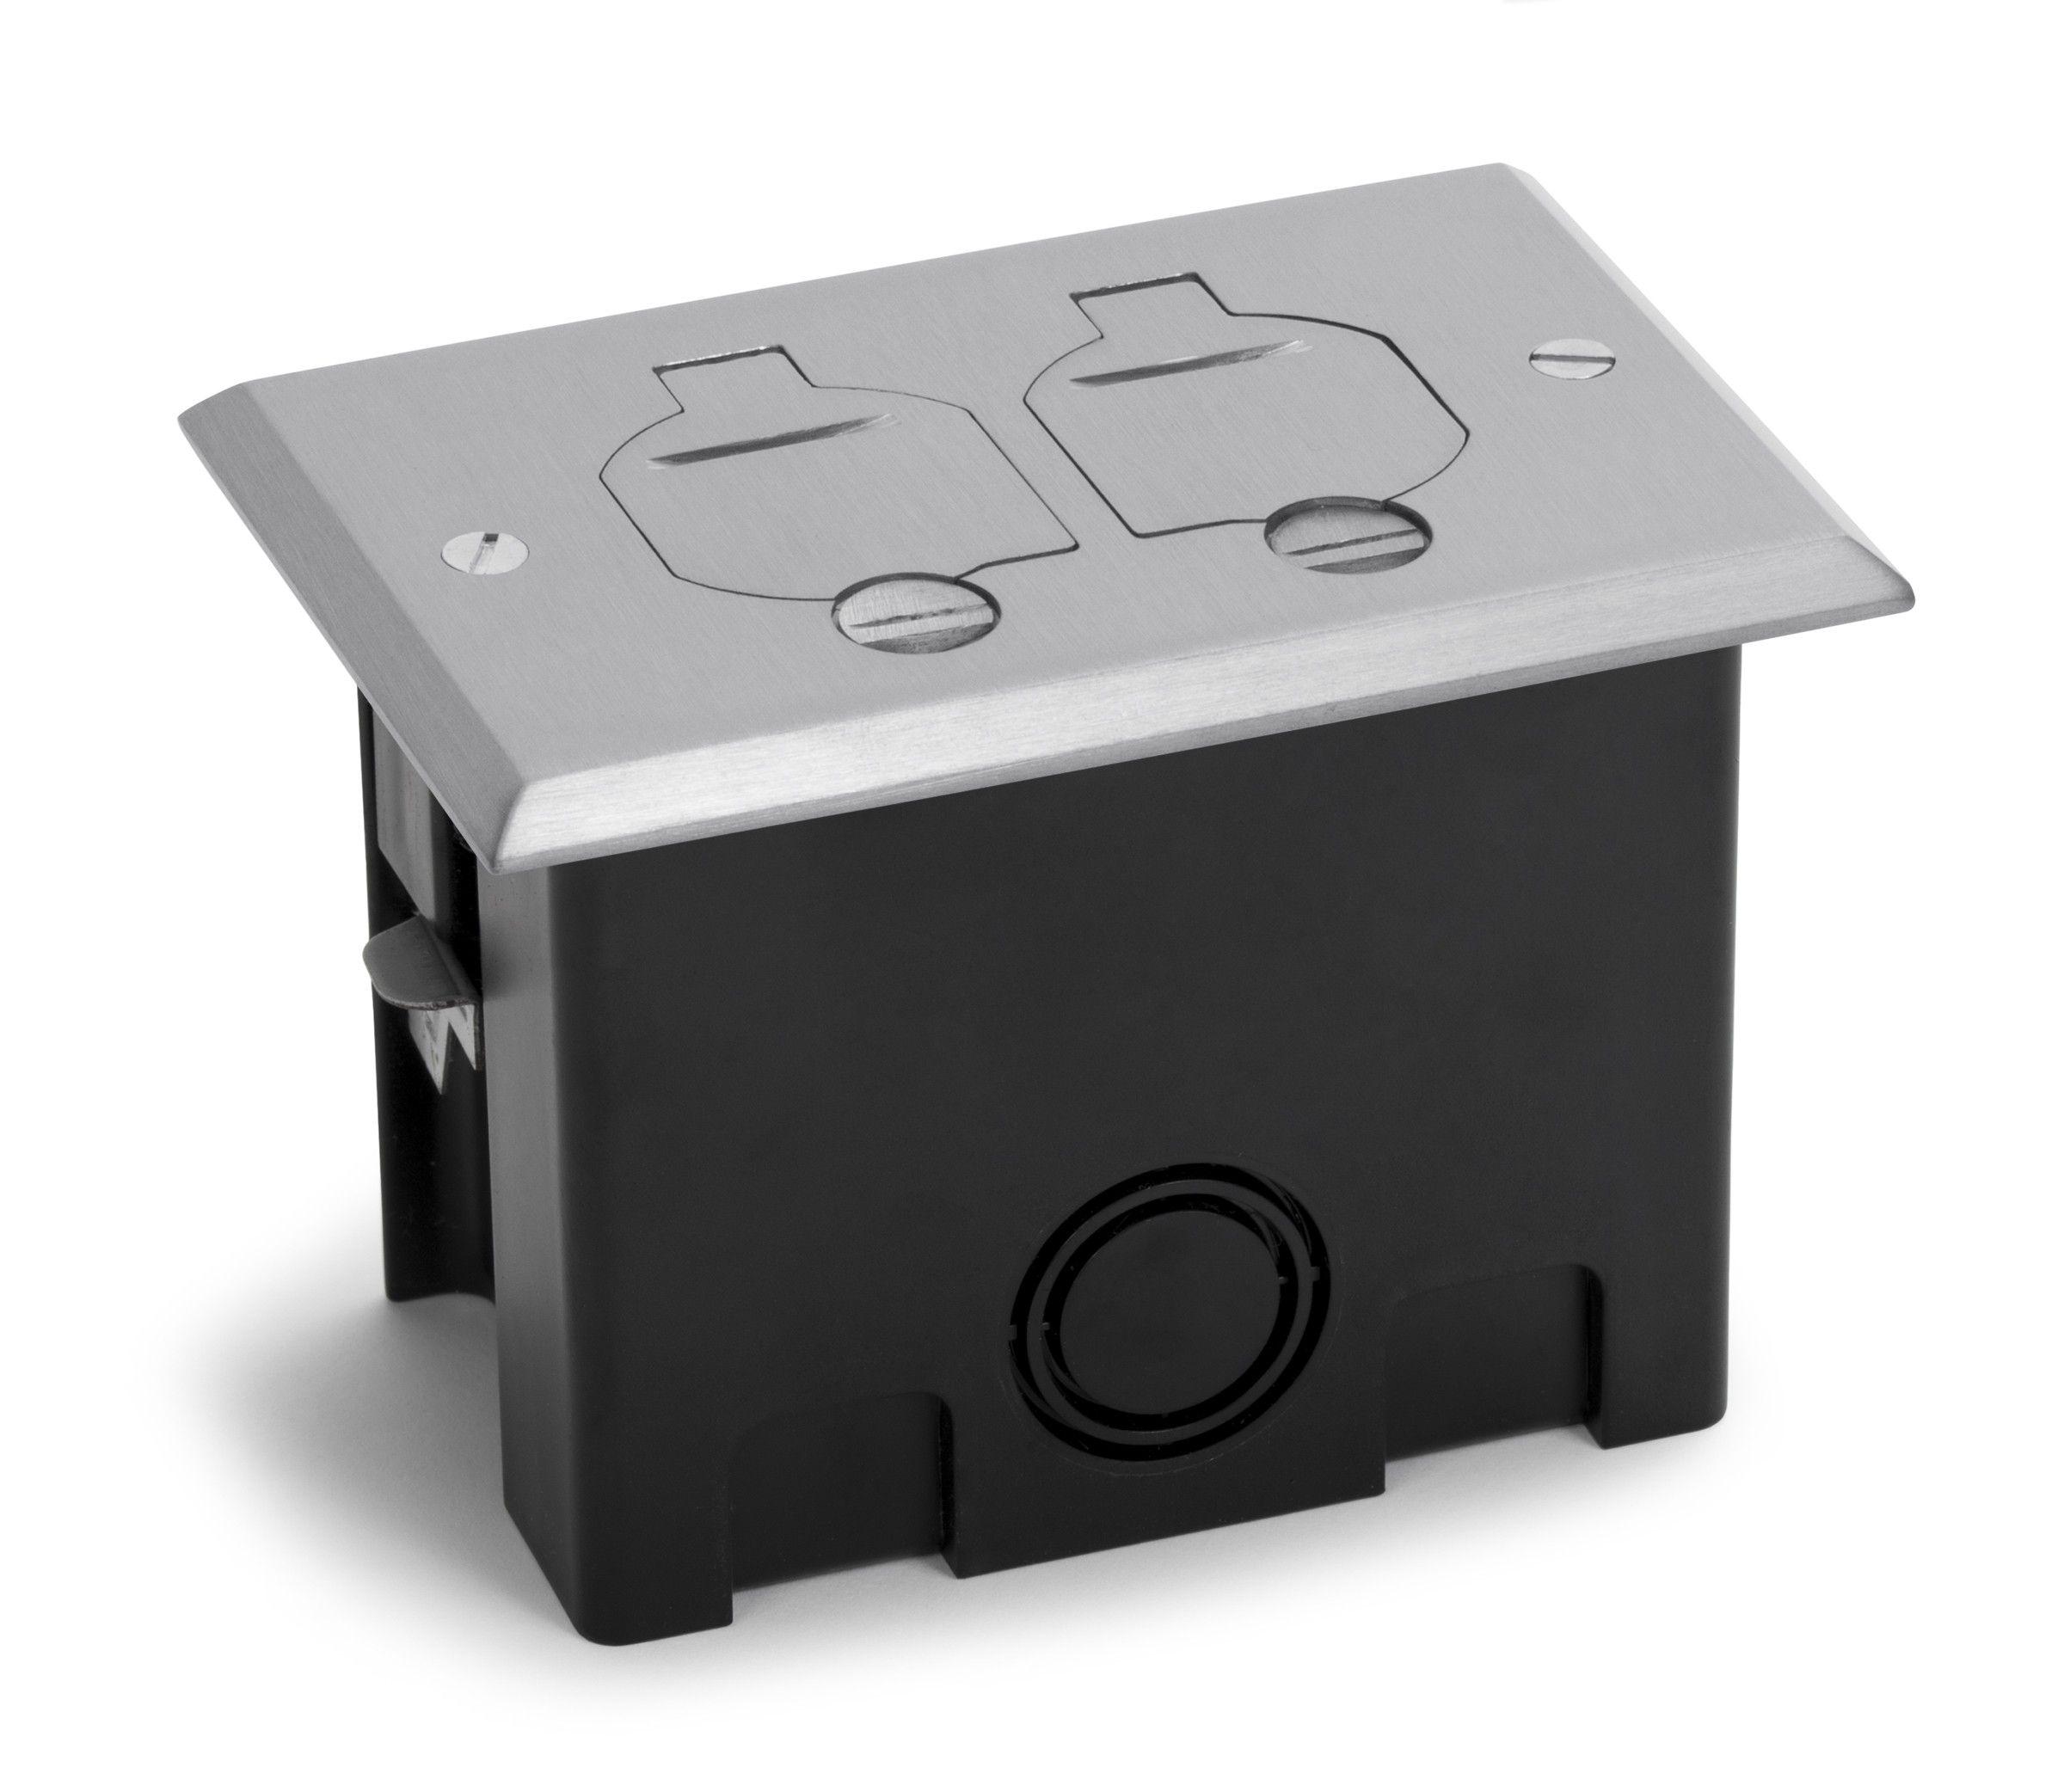 Rectangular Plastic Boxes For Wood Floors In Brass Or Aluminum